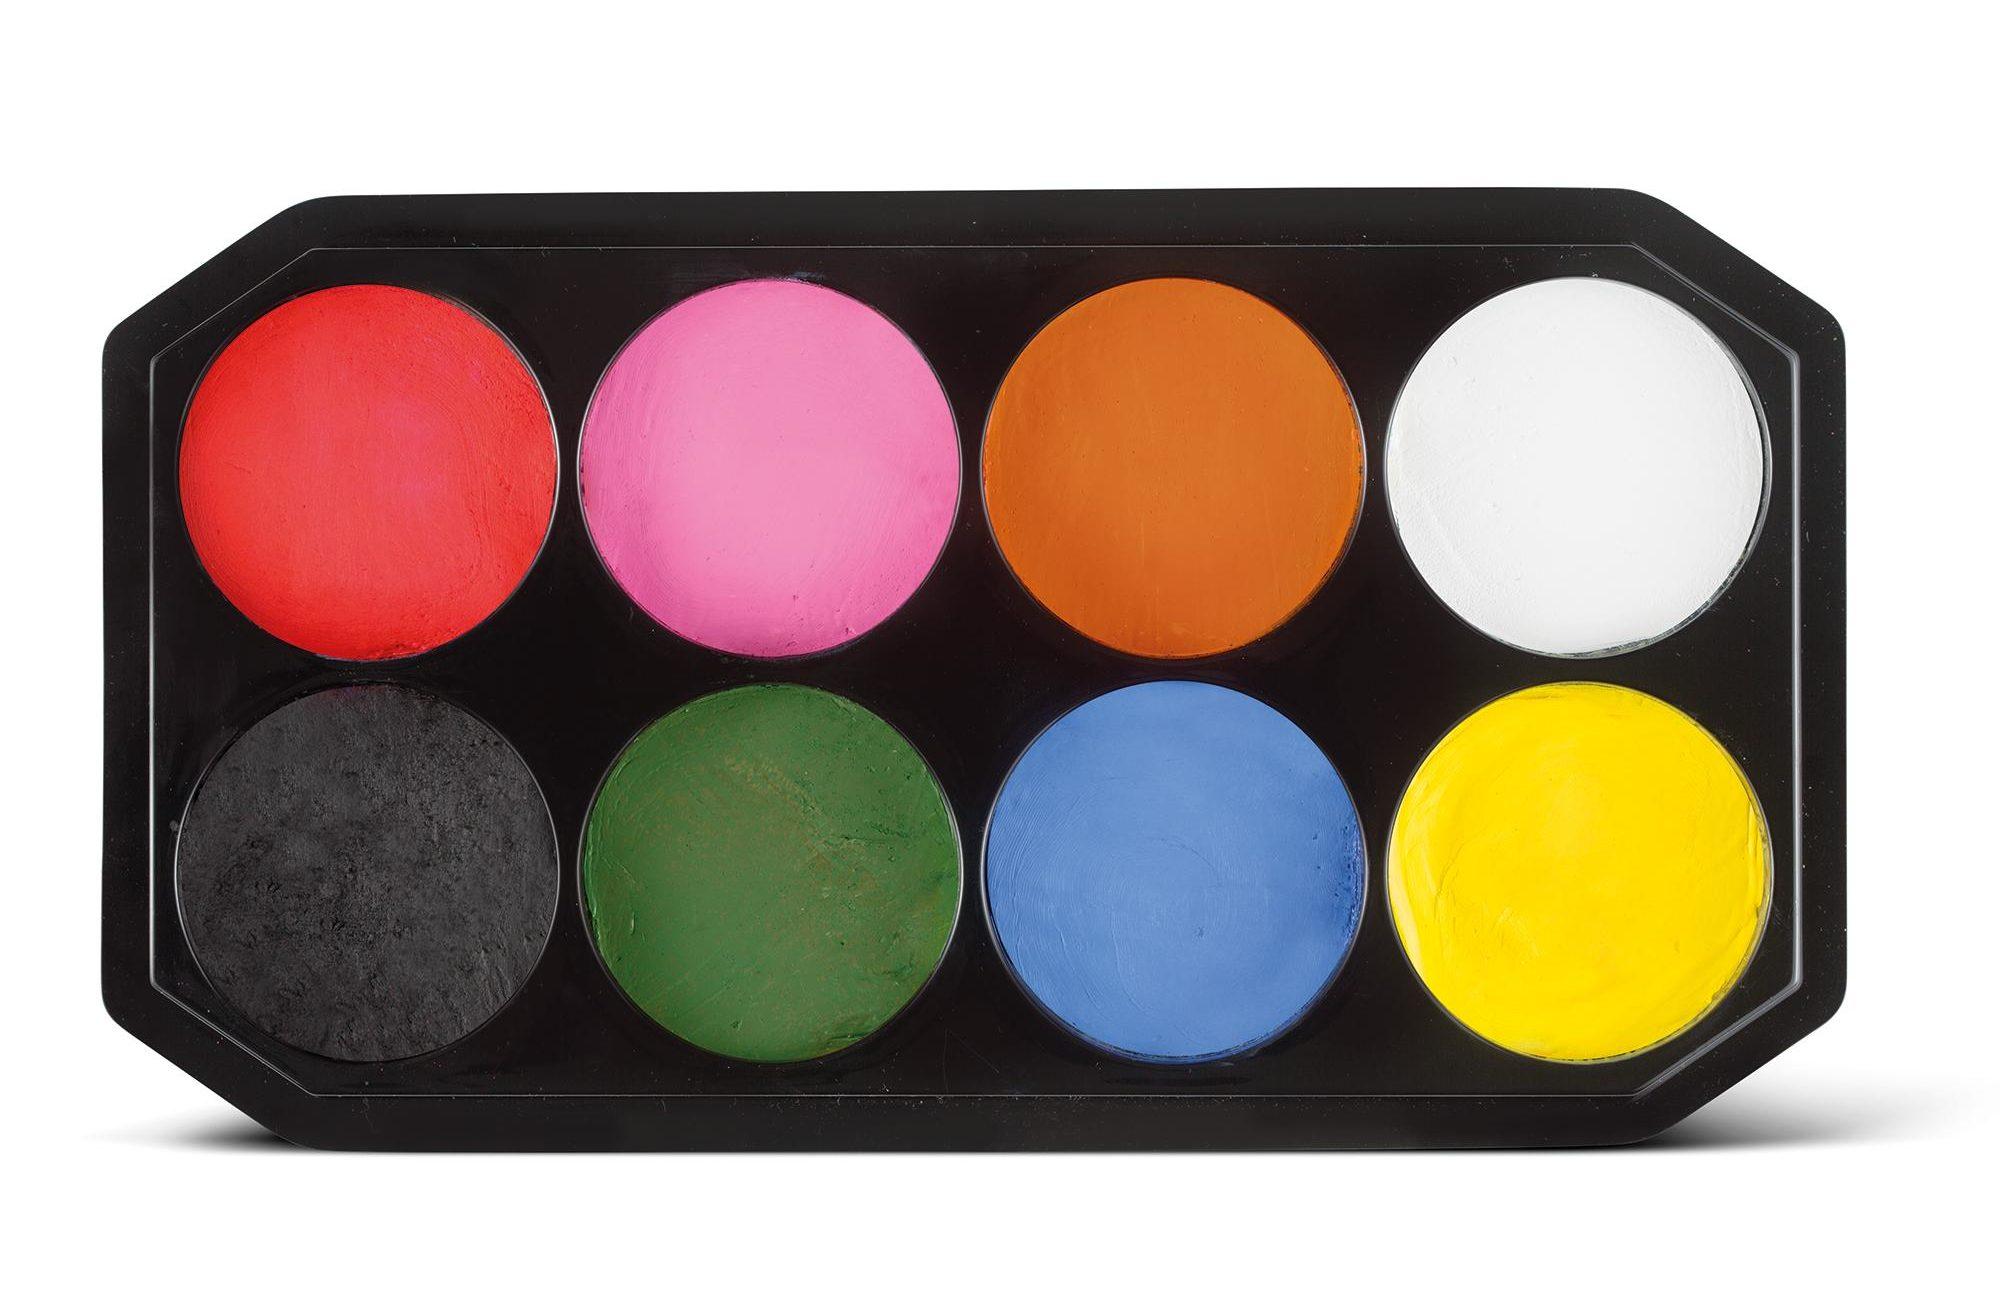 Snazaroo 18ml Face Paint Palette